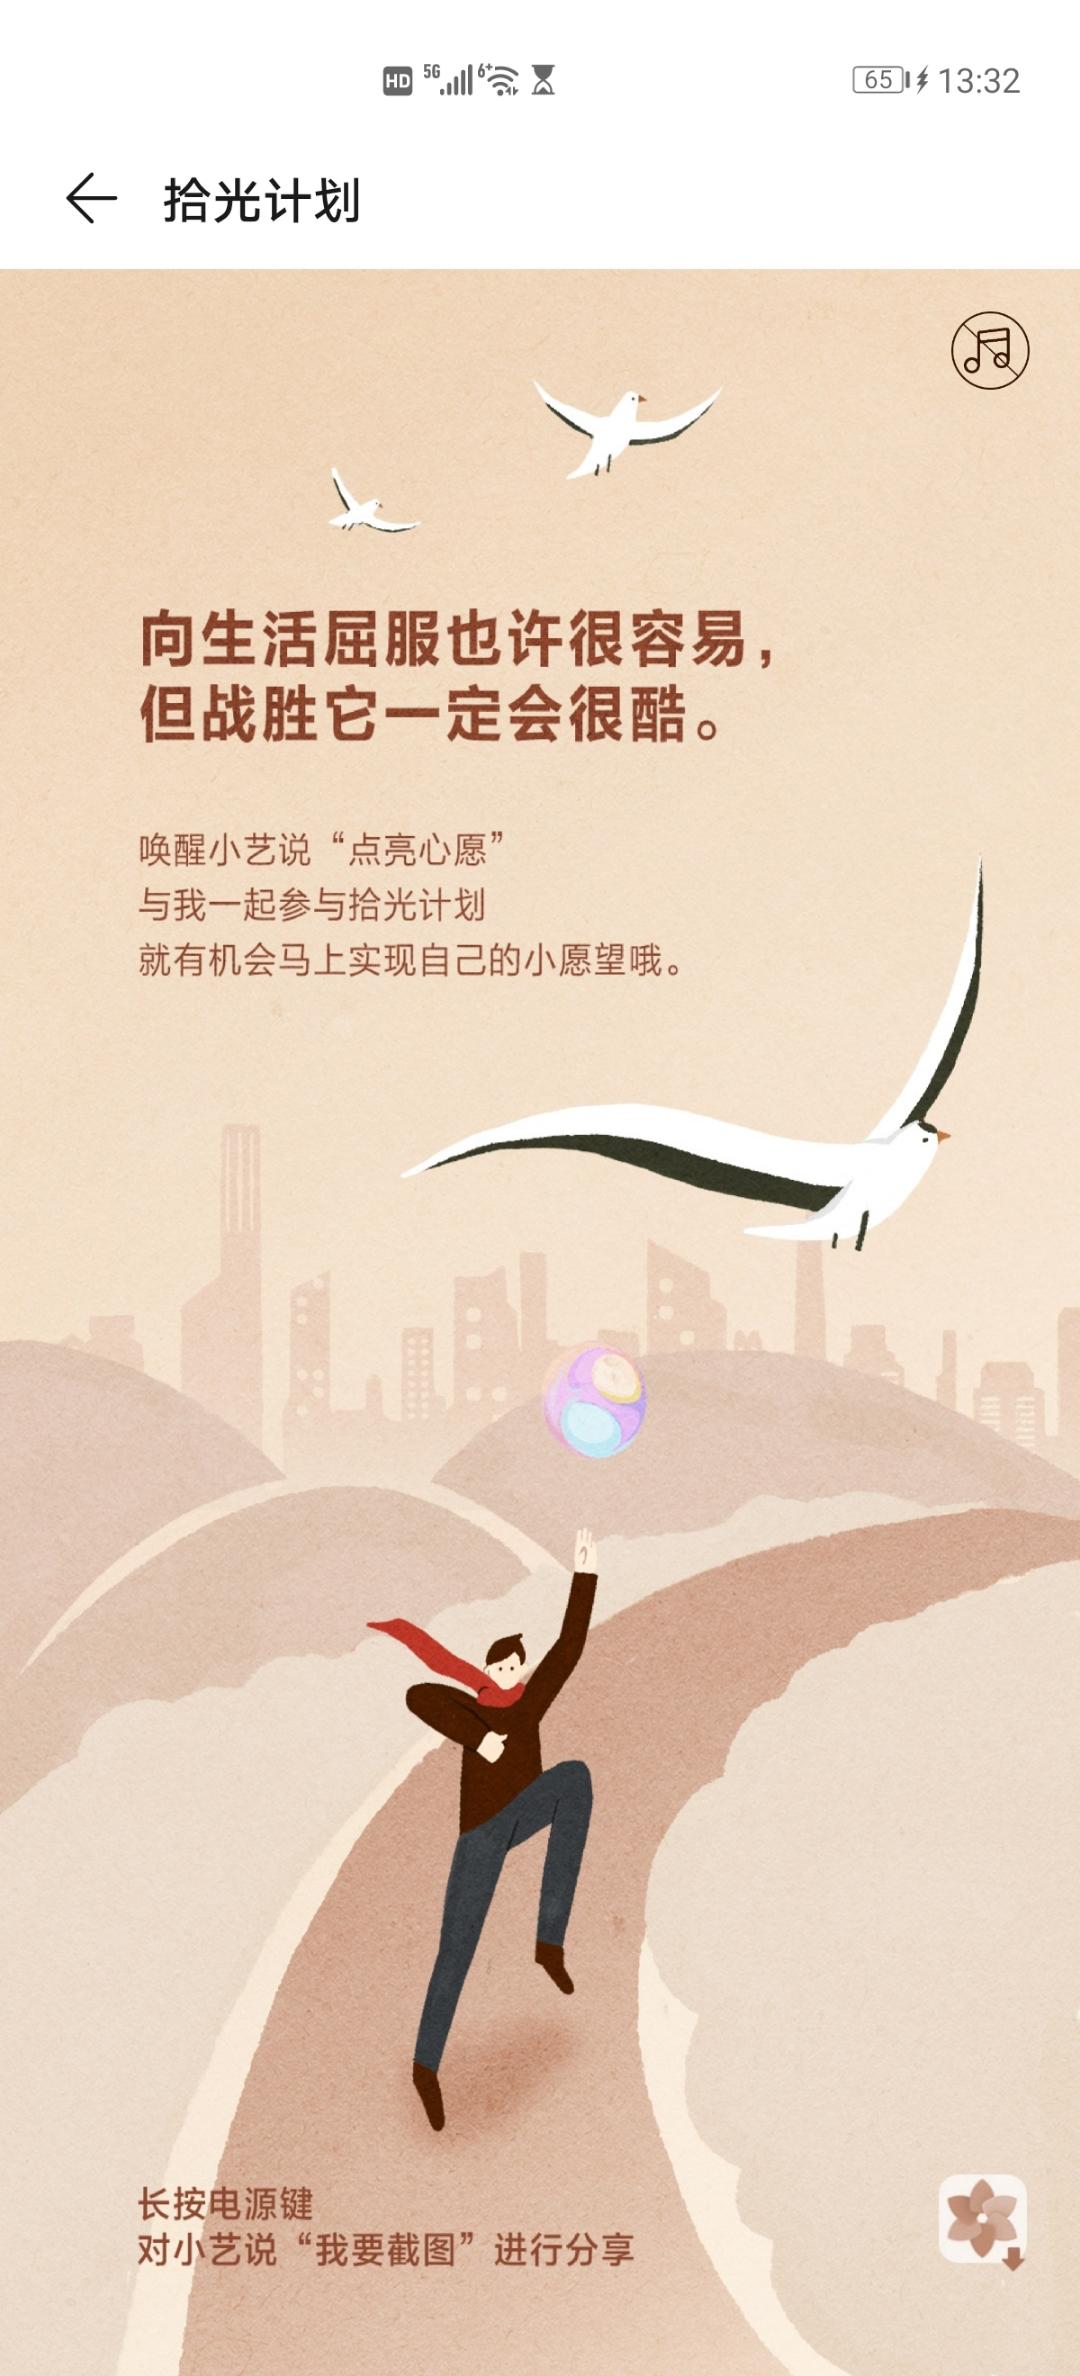 Screenshot_20201118_133234_com.huawei.vassistant.jpg